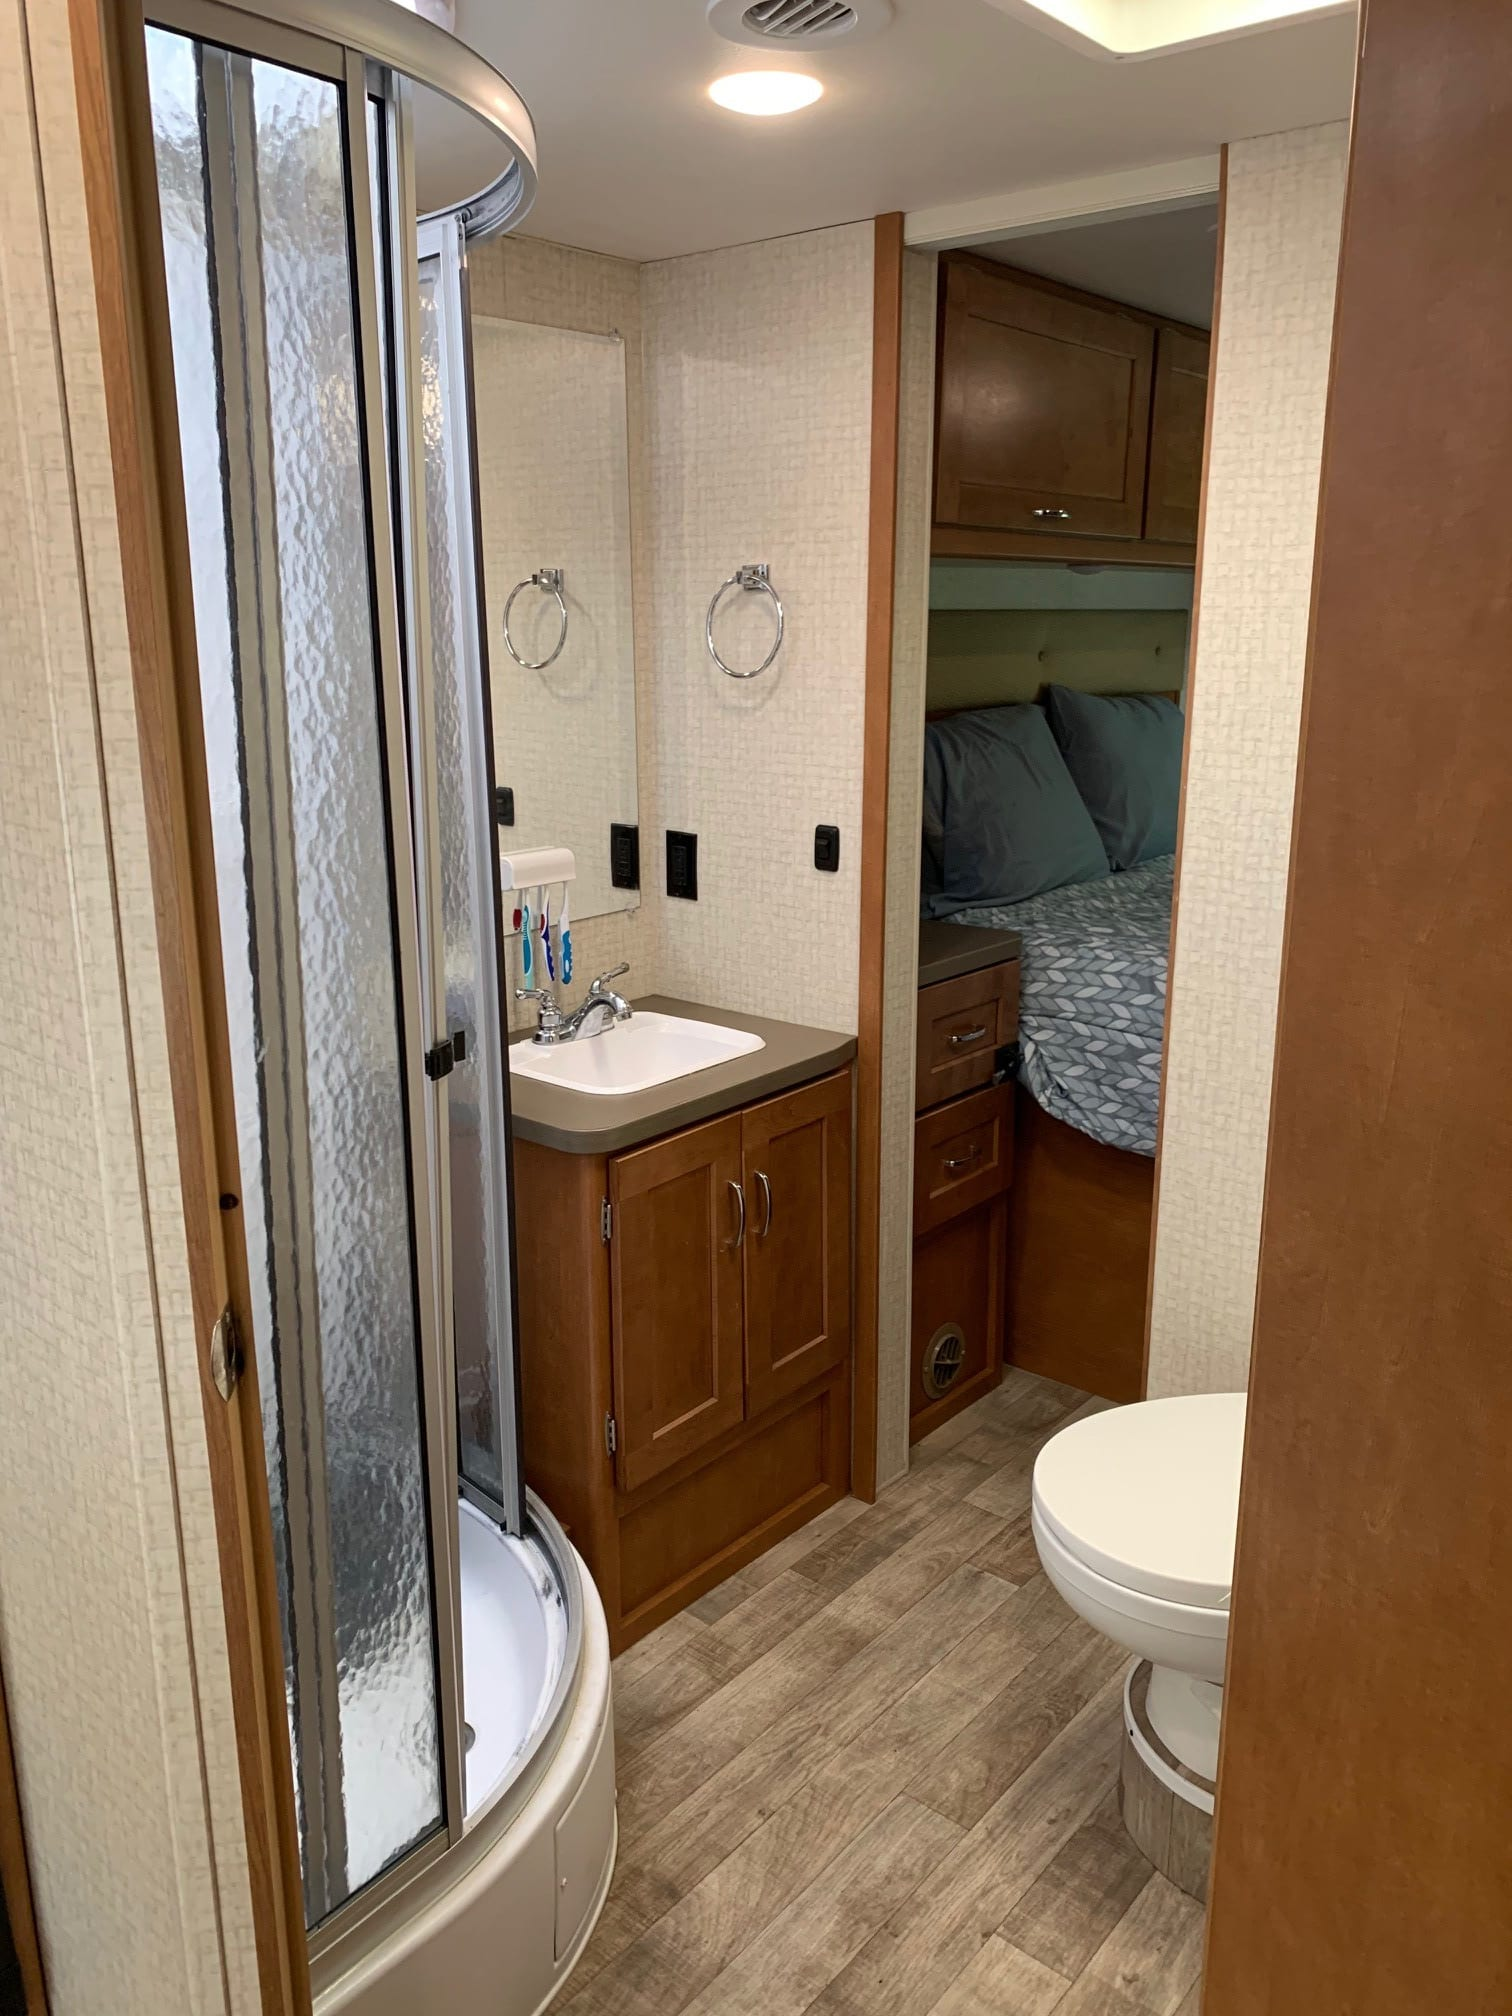 Bathroom and Shower. Winnebago Minnie Winnie 2018